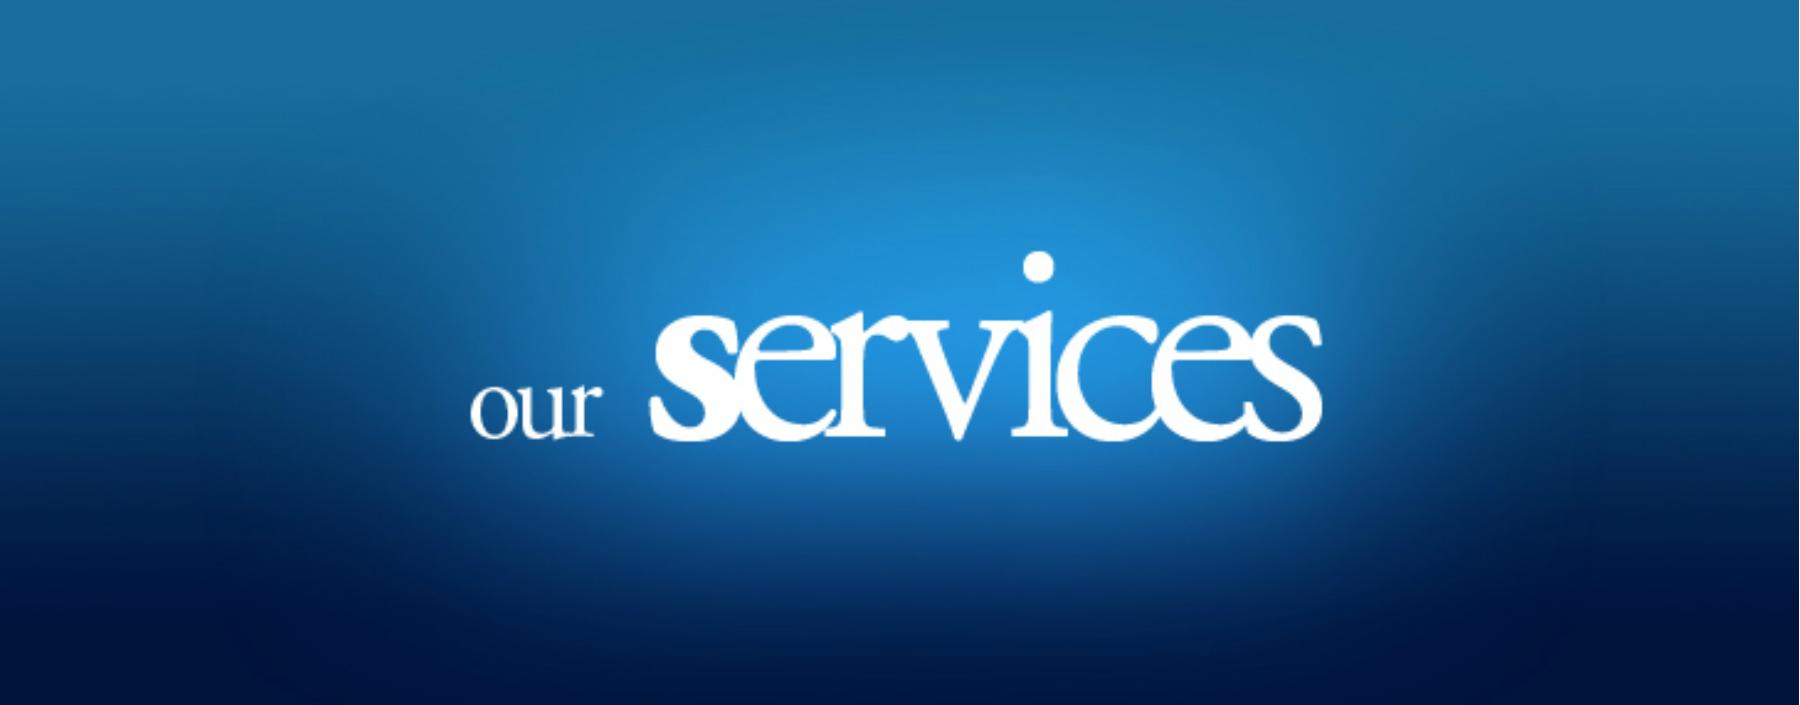 V2 services